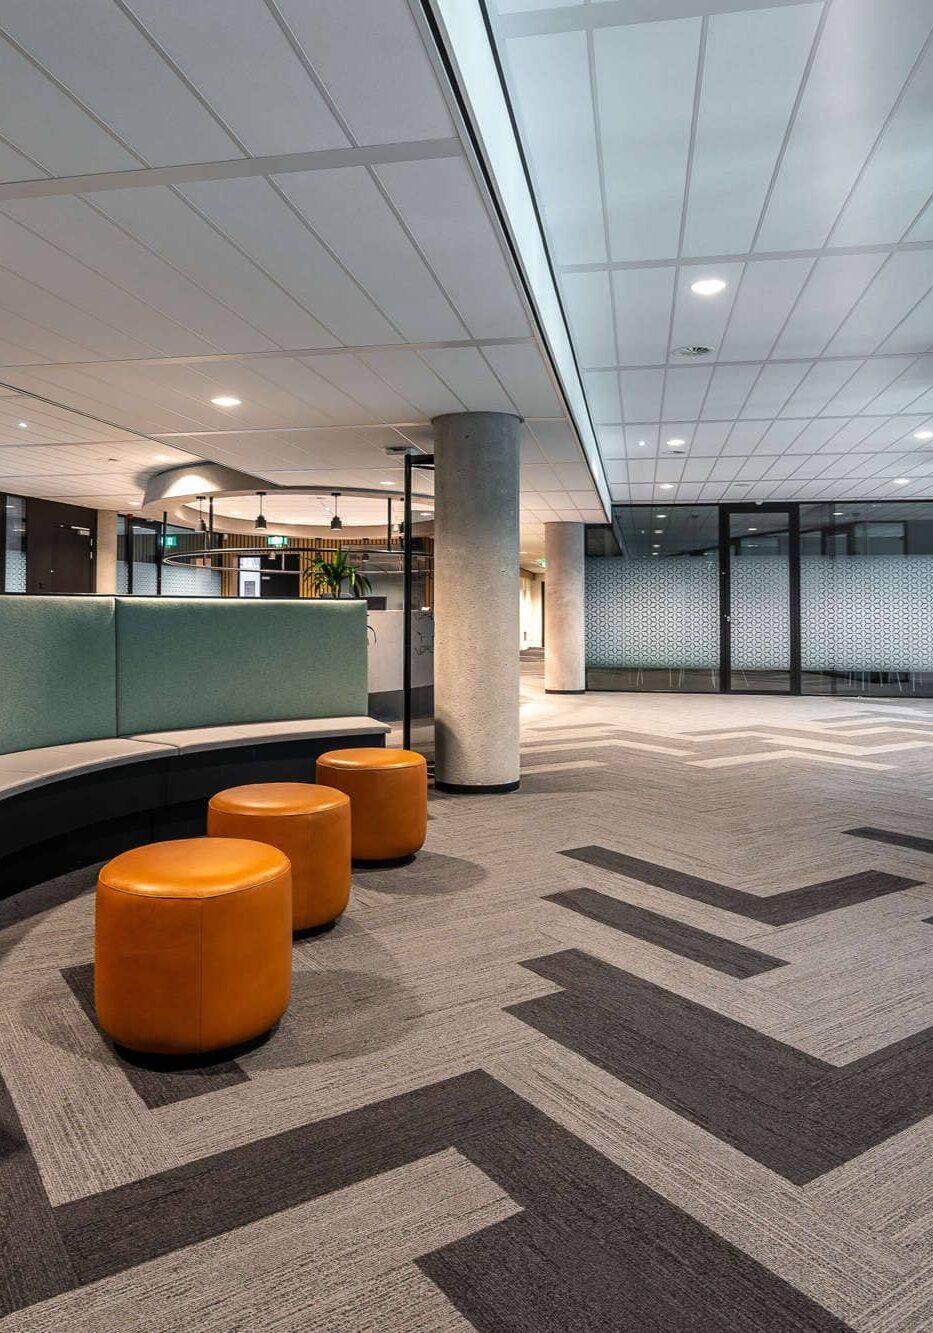 The lobby area of an office building